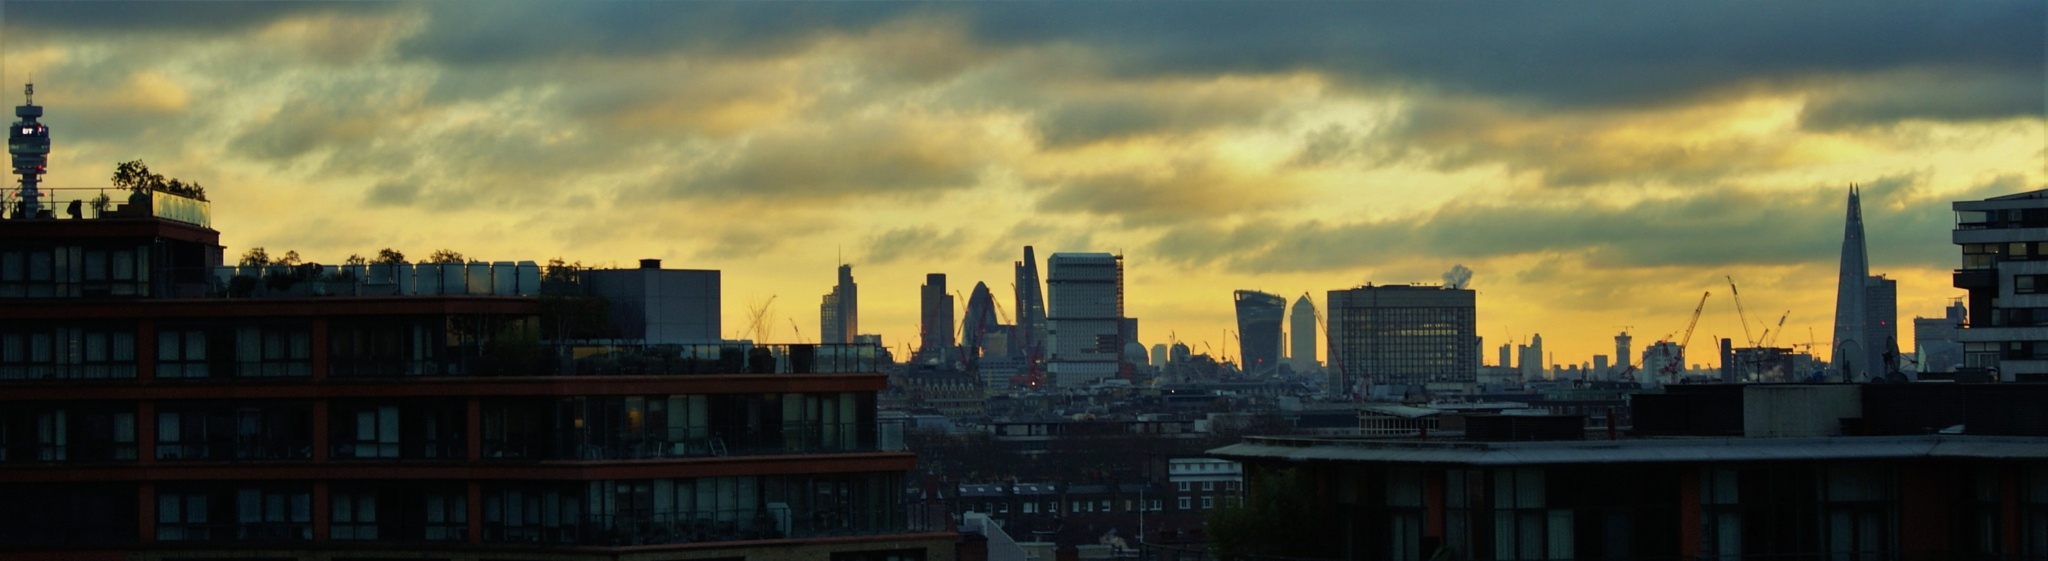 London Skyline Sunrise by Tracy Bruce